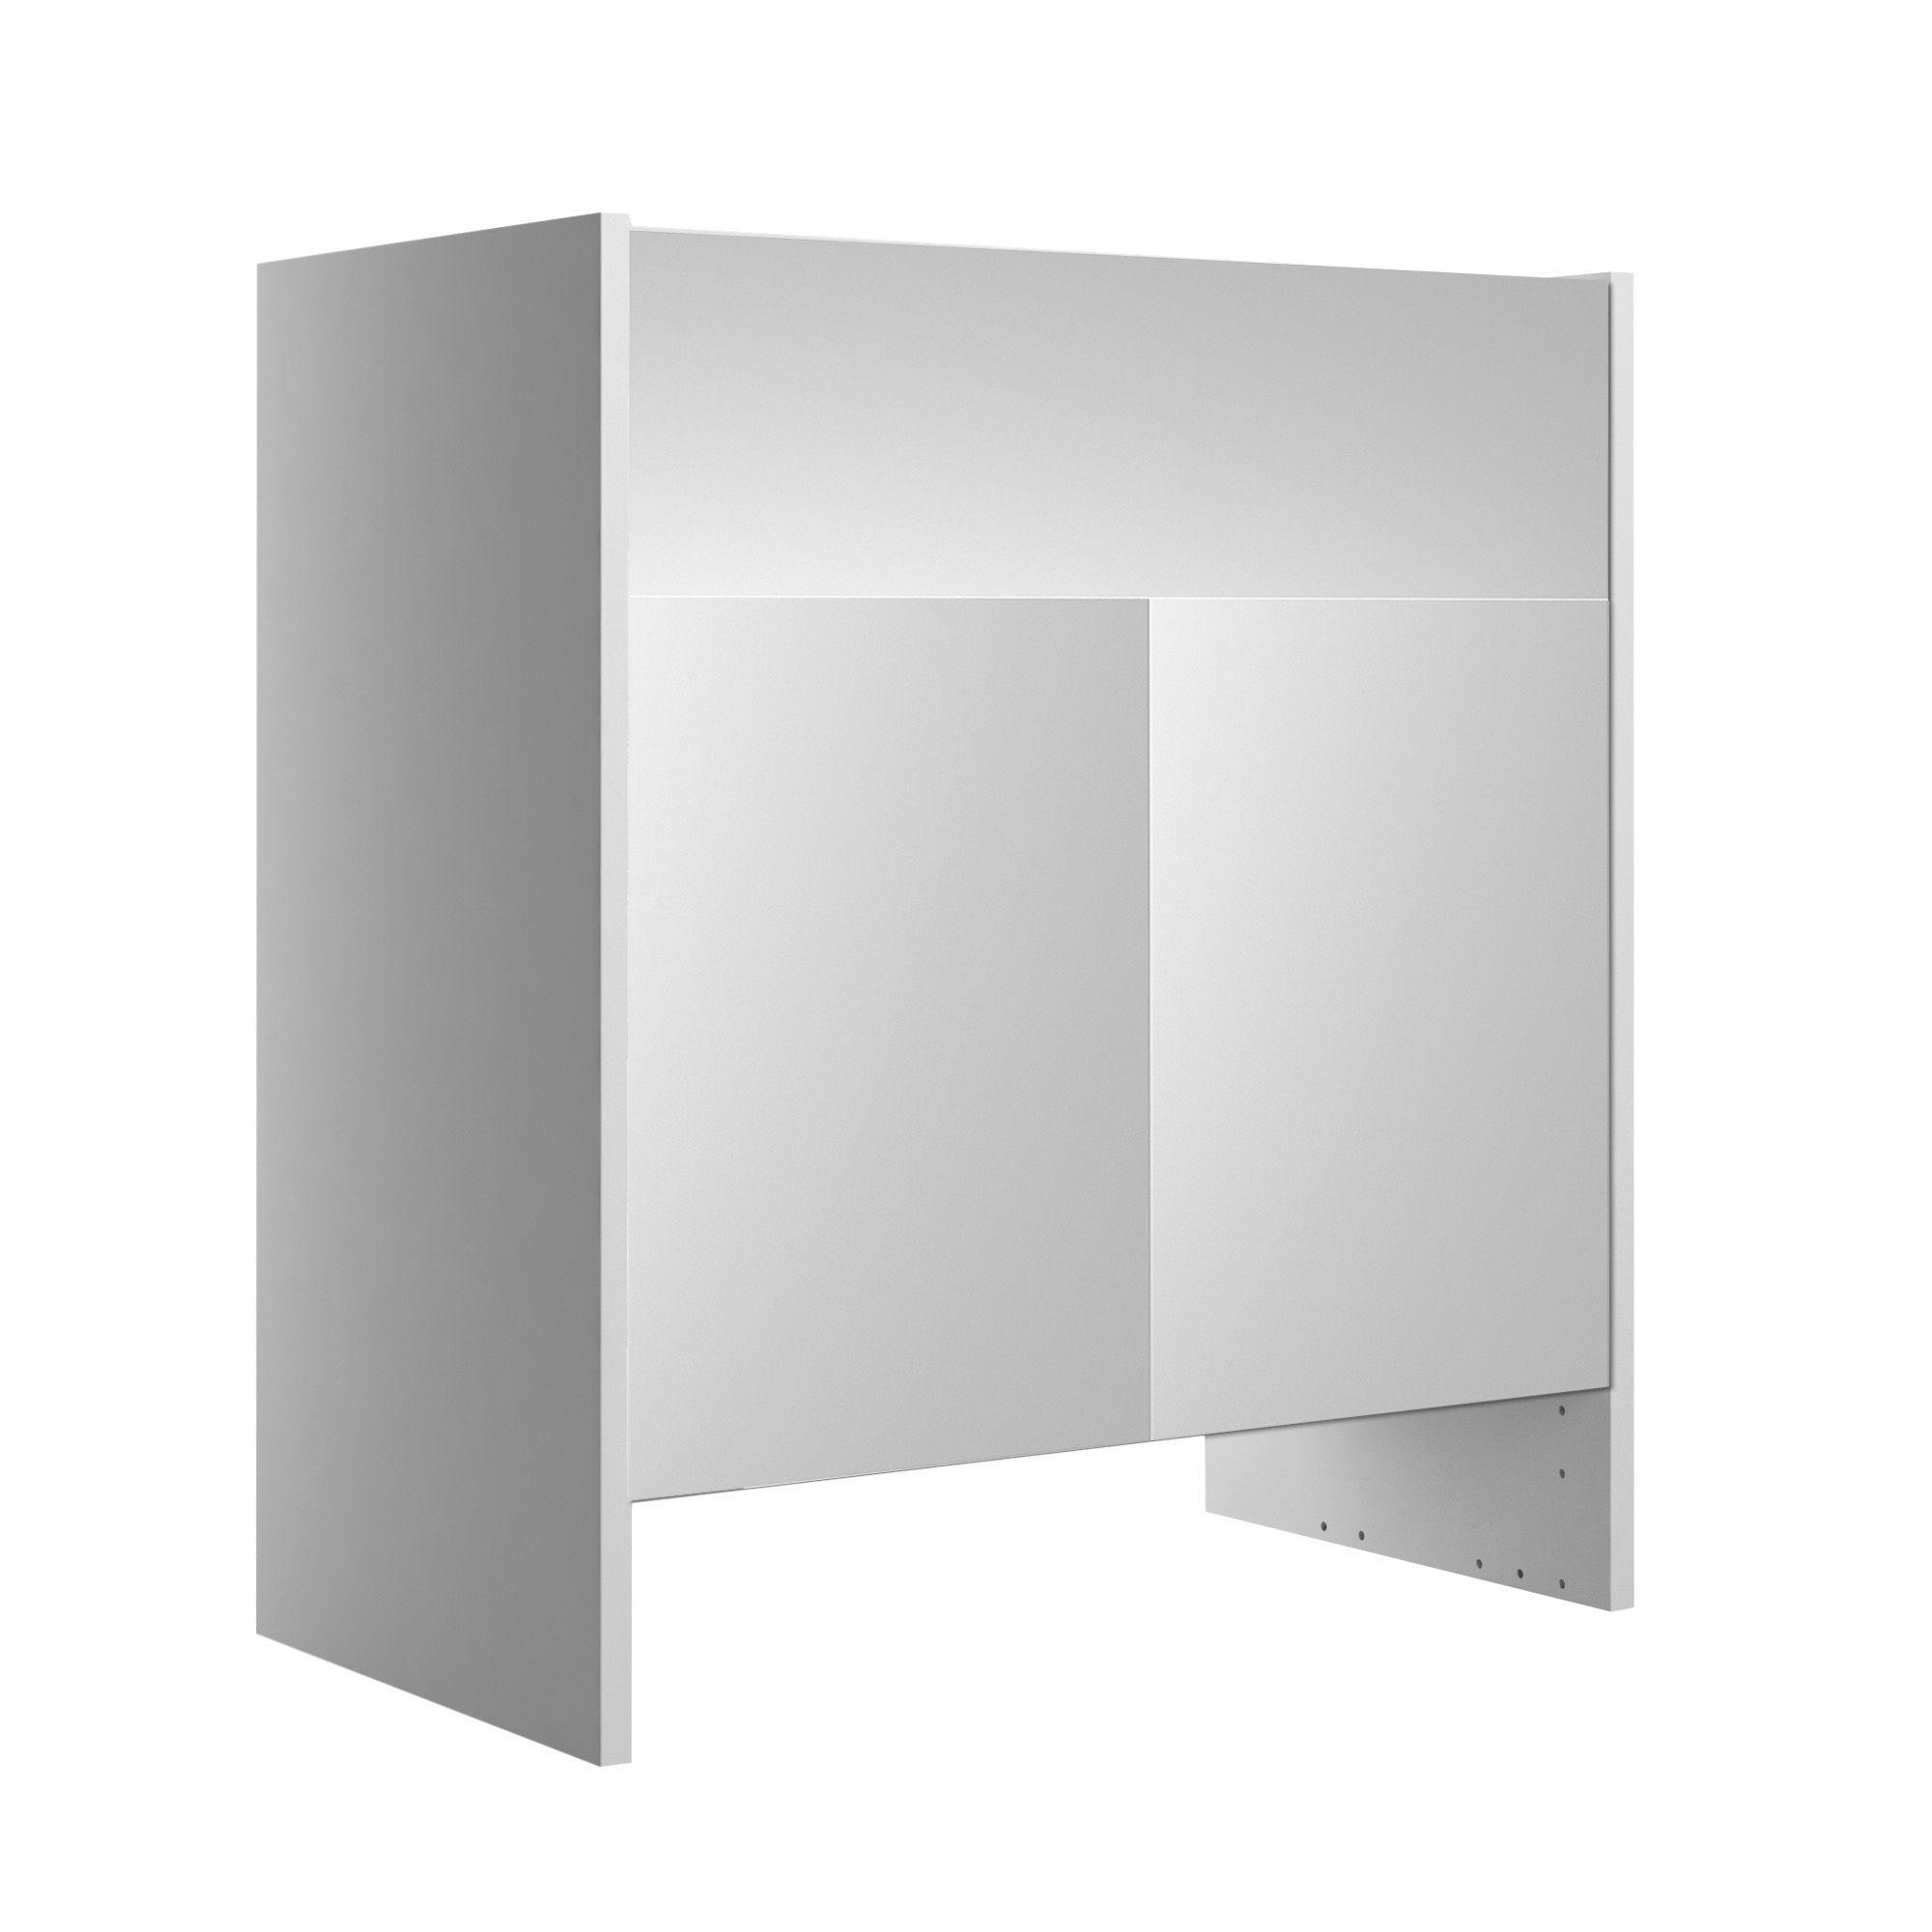 Cooke Lewis Marletti Gloss White Basin Cabinet